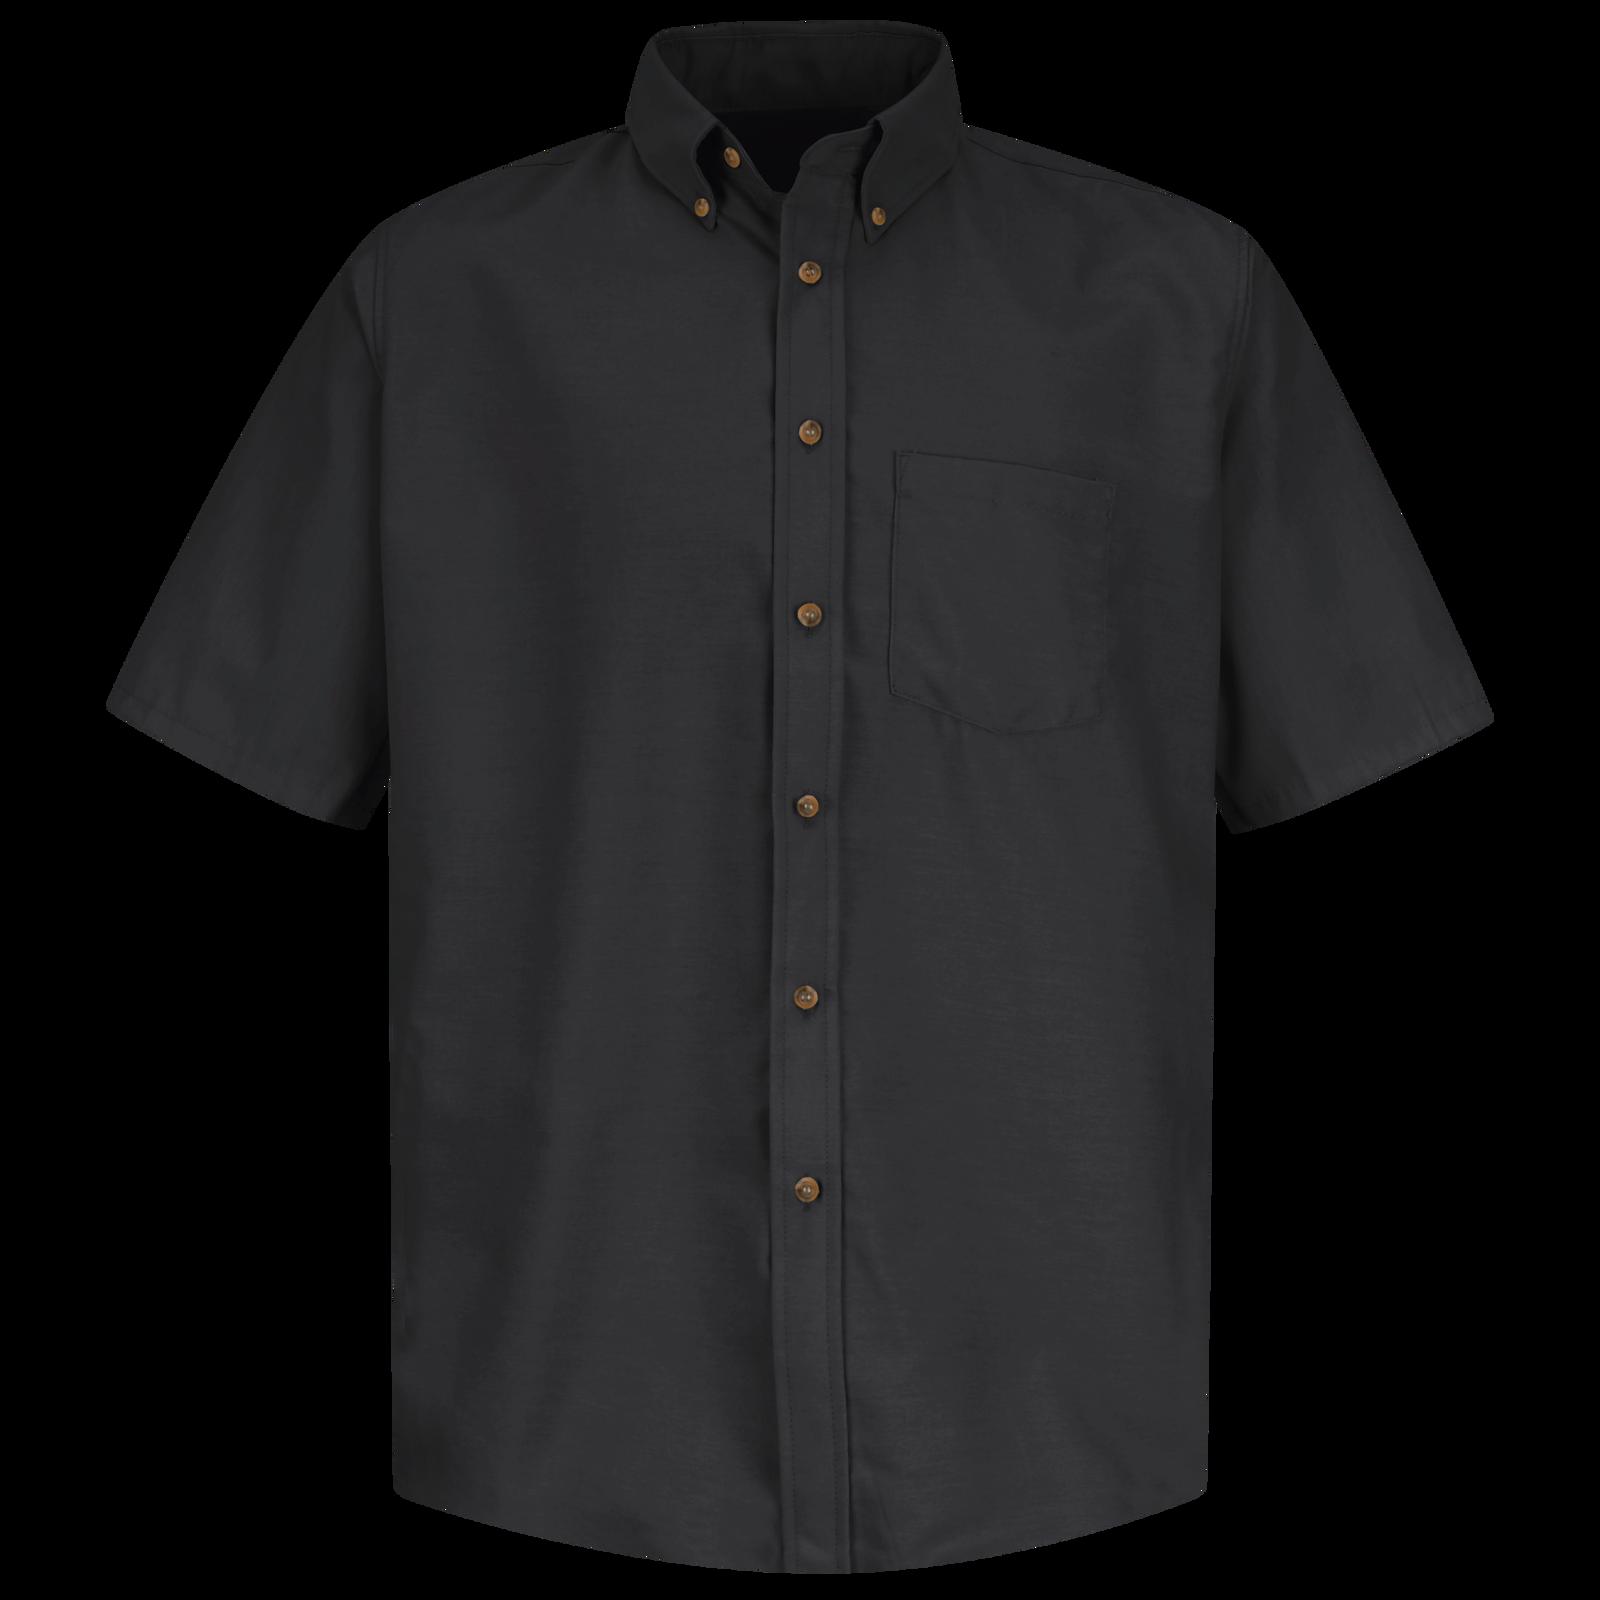 Men's Short Sleeve Poplin Dress Shirt   Red Kap®